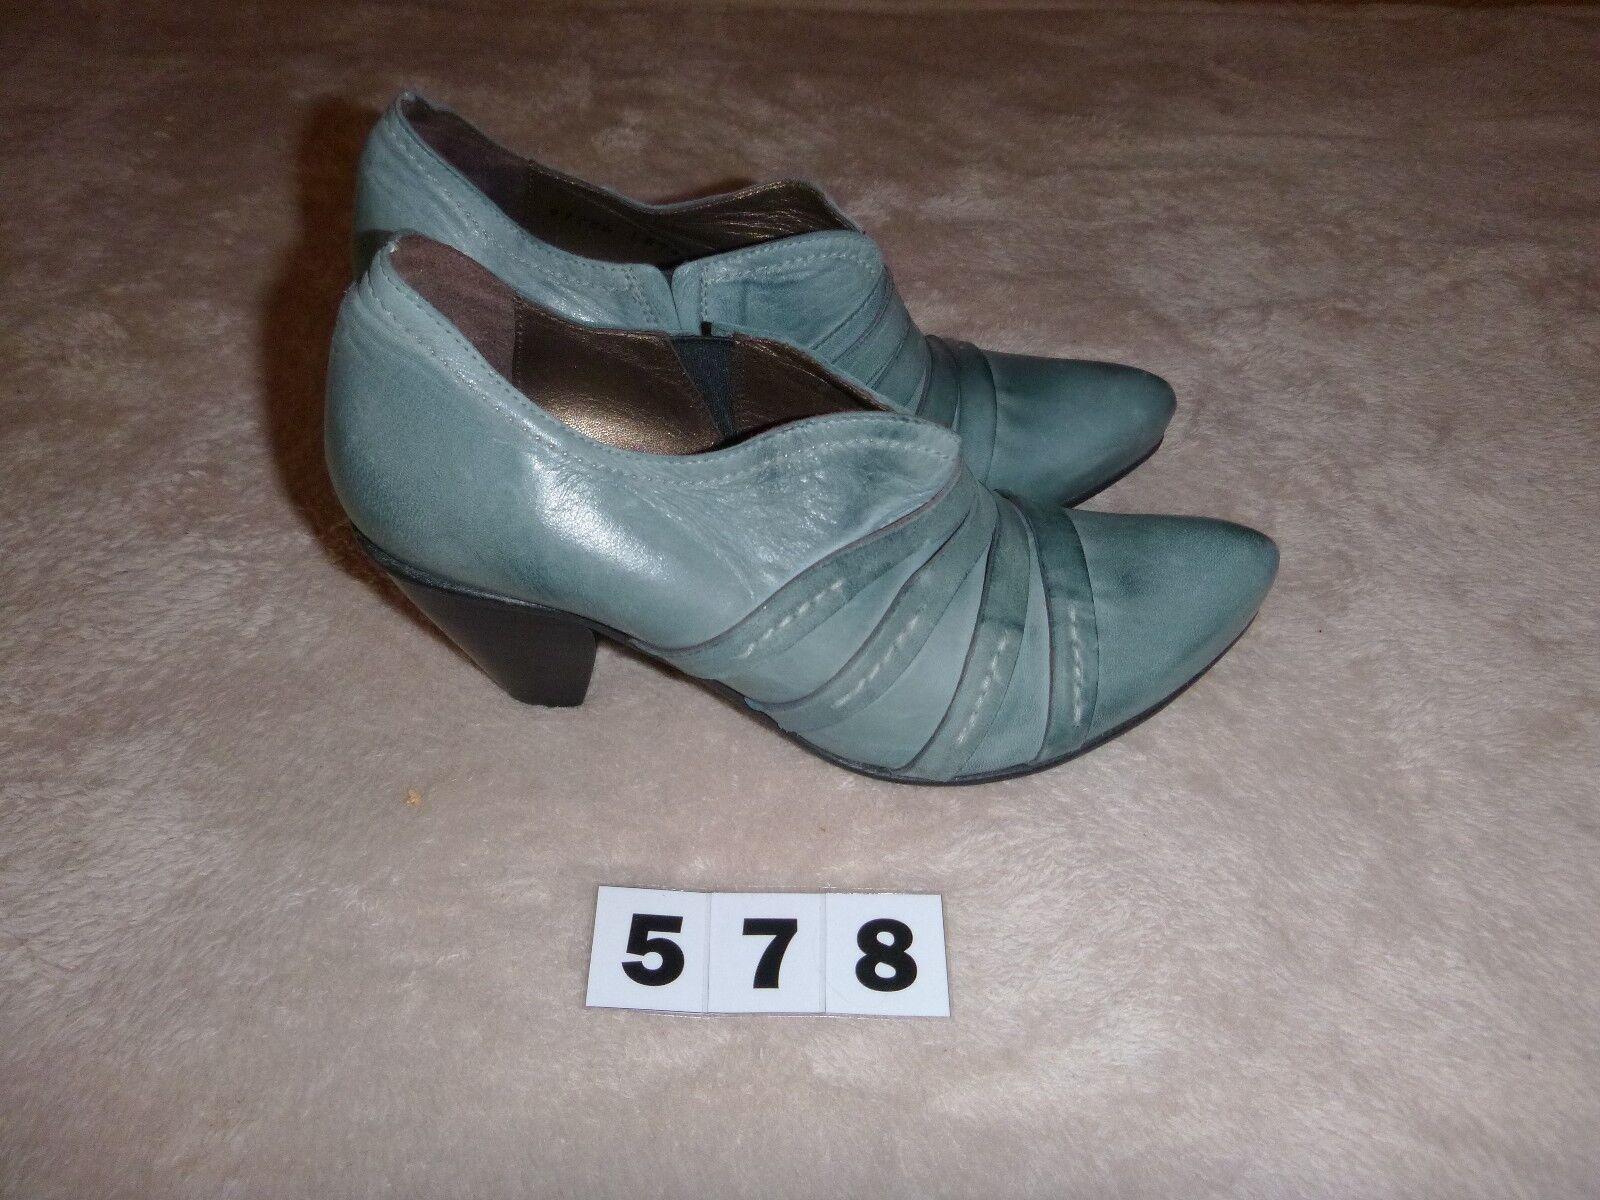 (578) Fidji Damen-Halbschuh Pumps Gr 36,5 36,5 36,5 Hellblau 1e5c2c